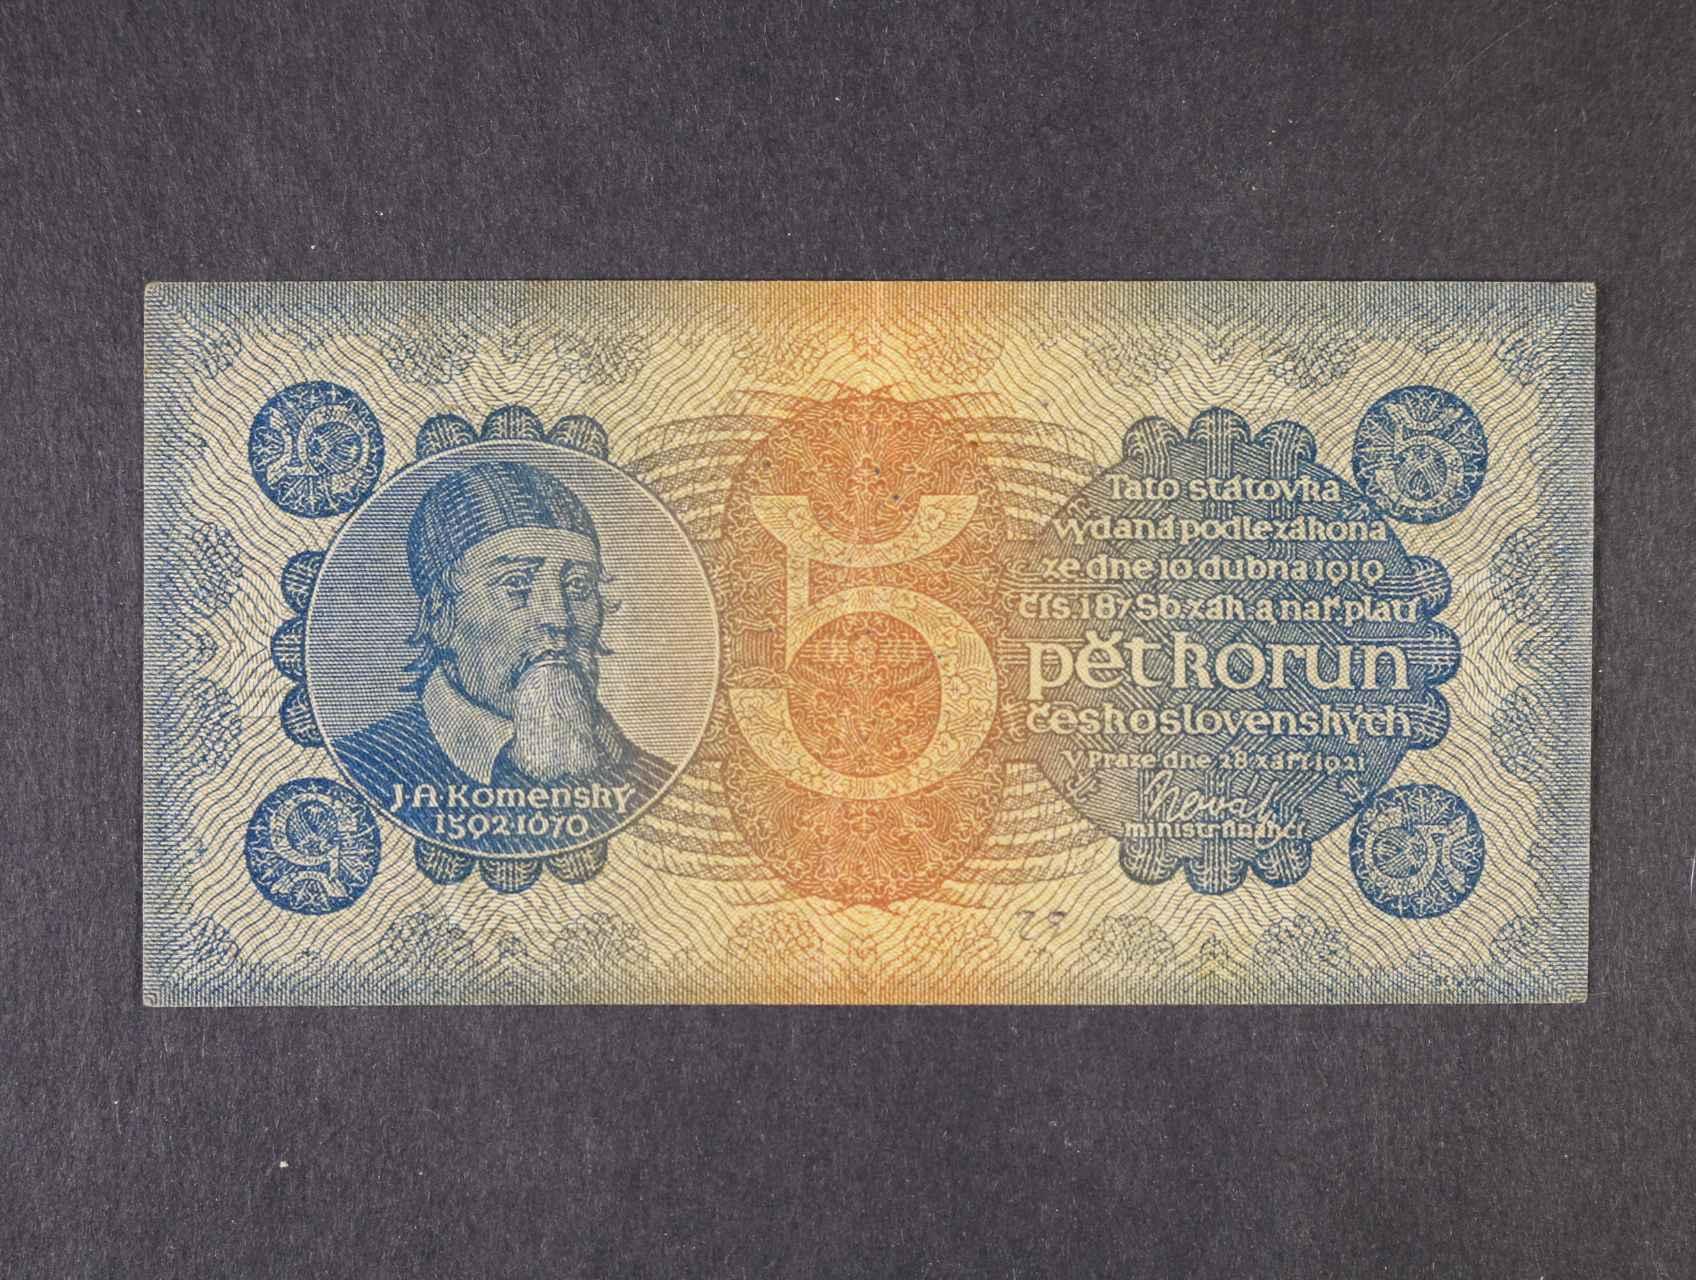 5 Kč 28.9.1921 série 3, Ba. 18,  Pi. 15